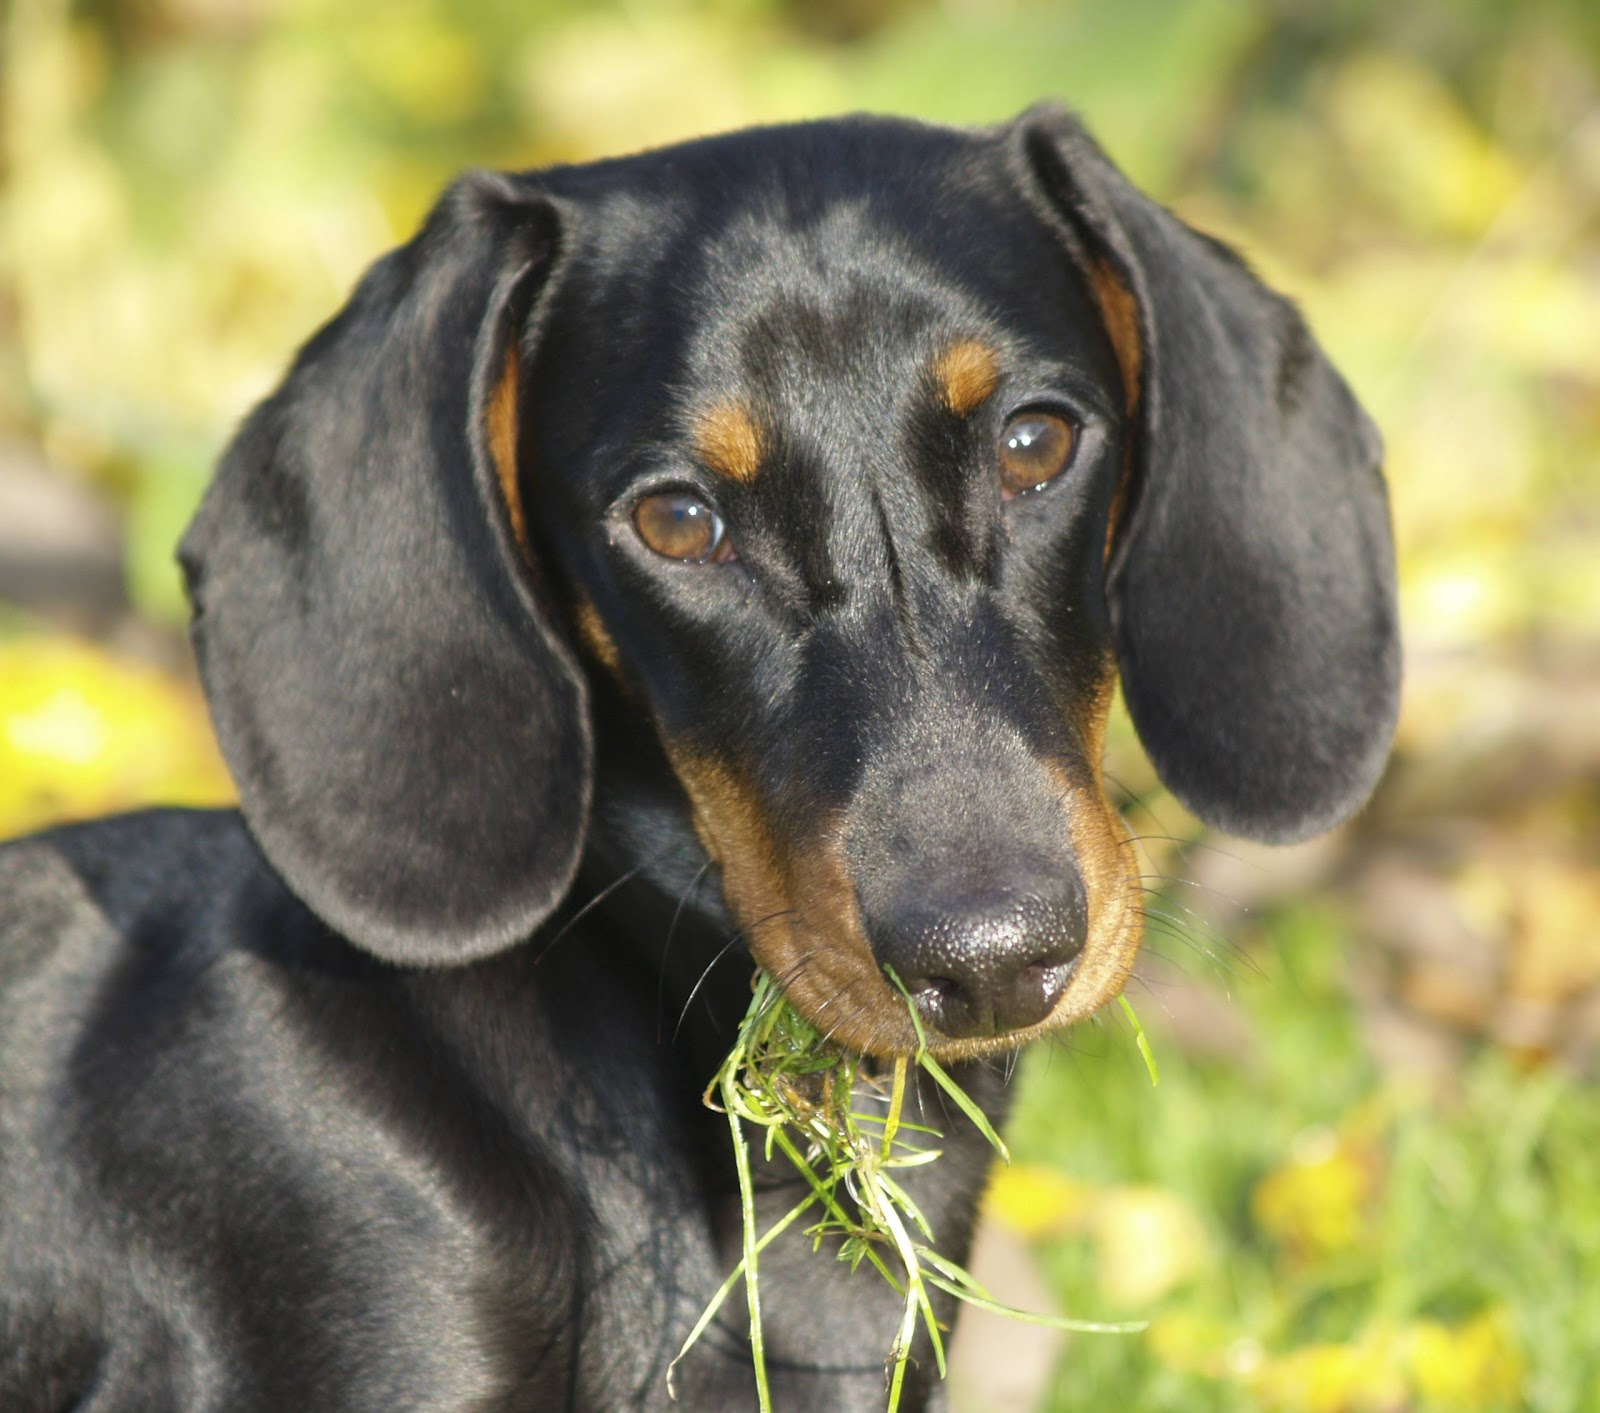 bita i gräset